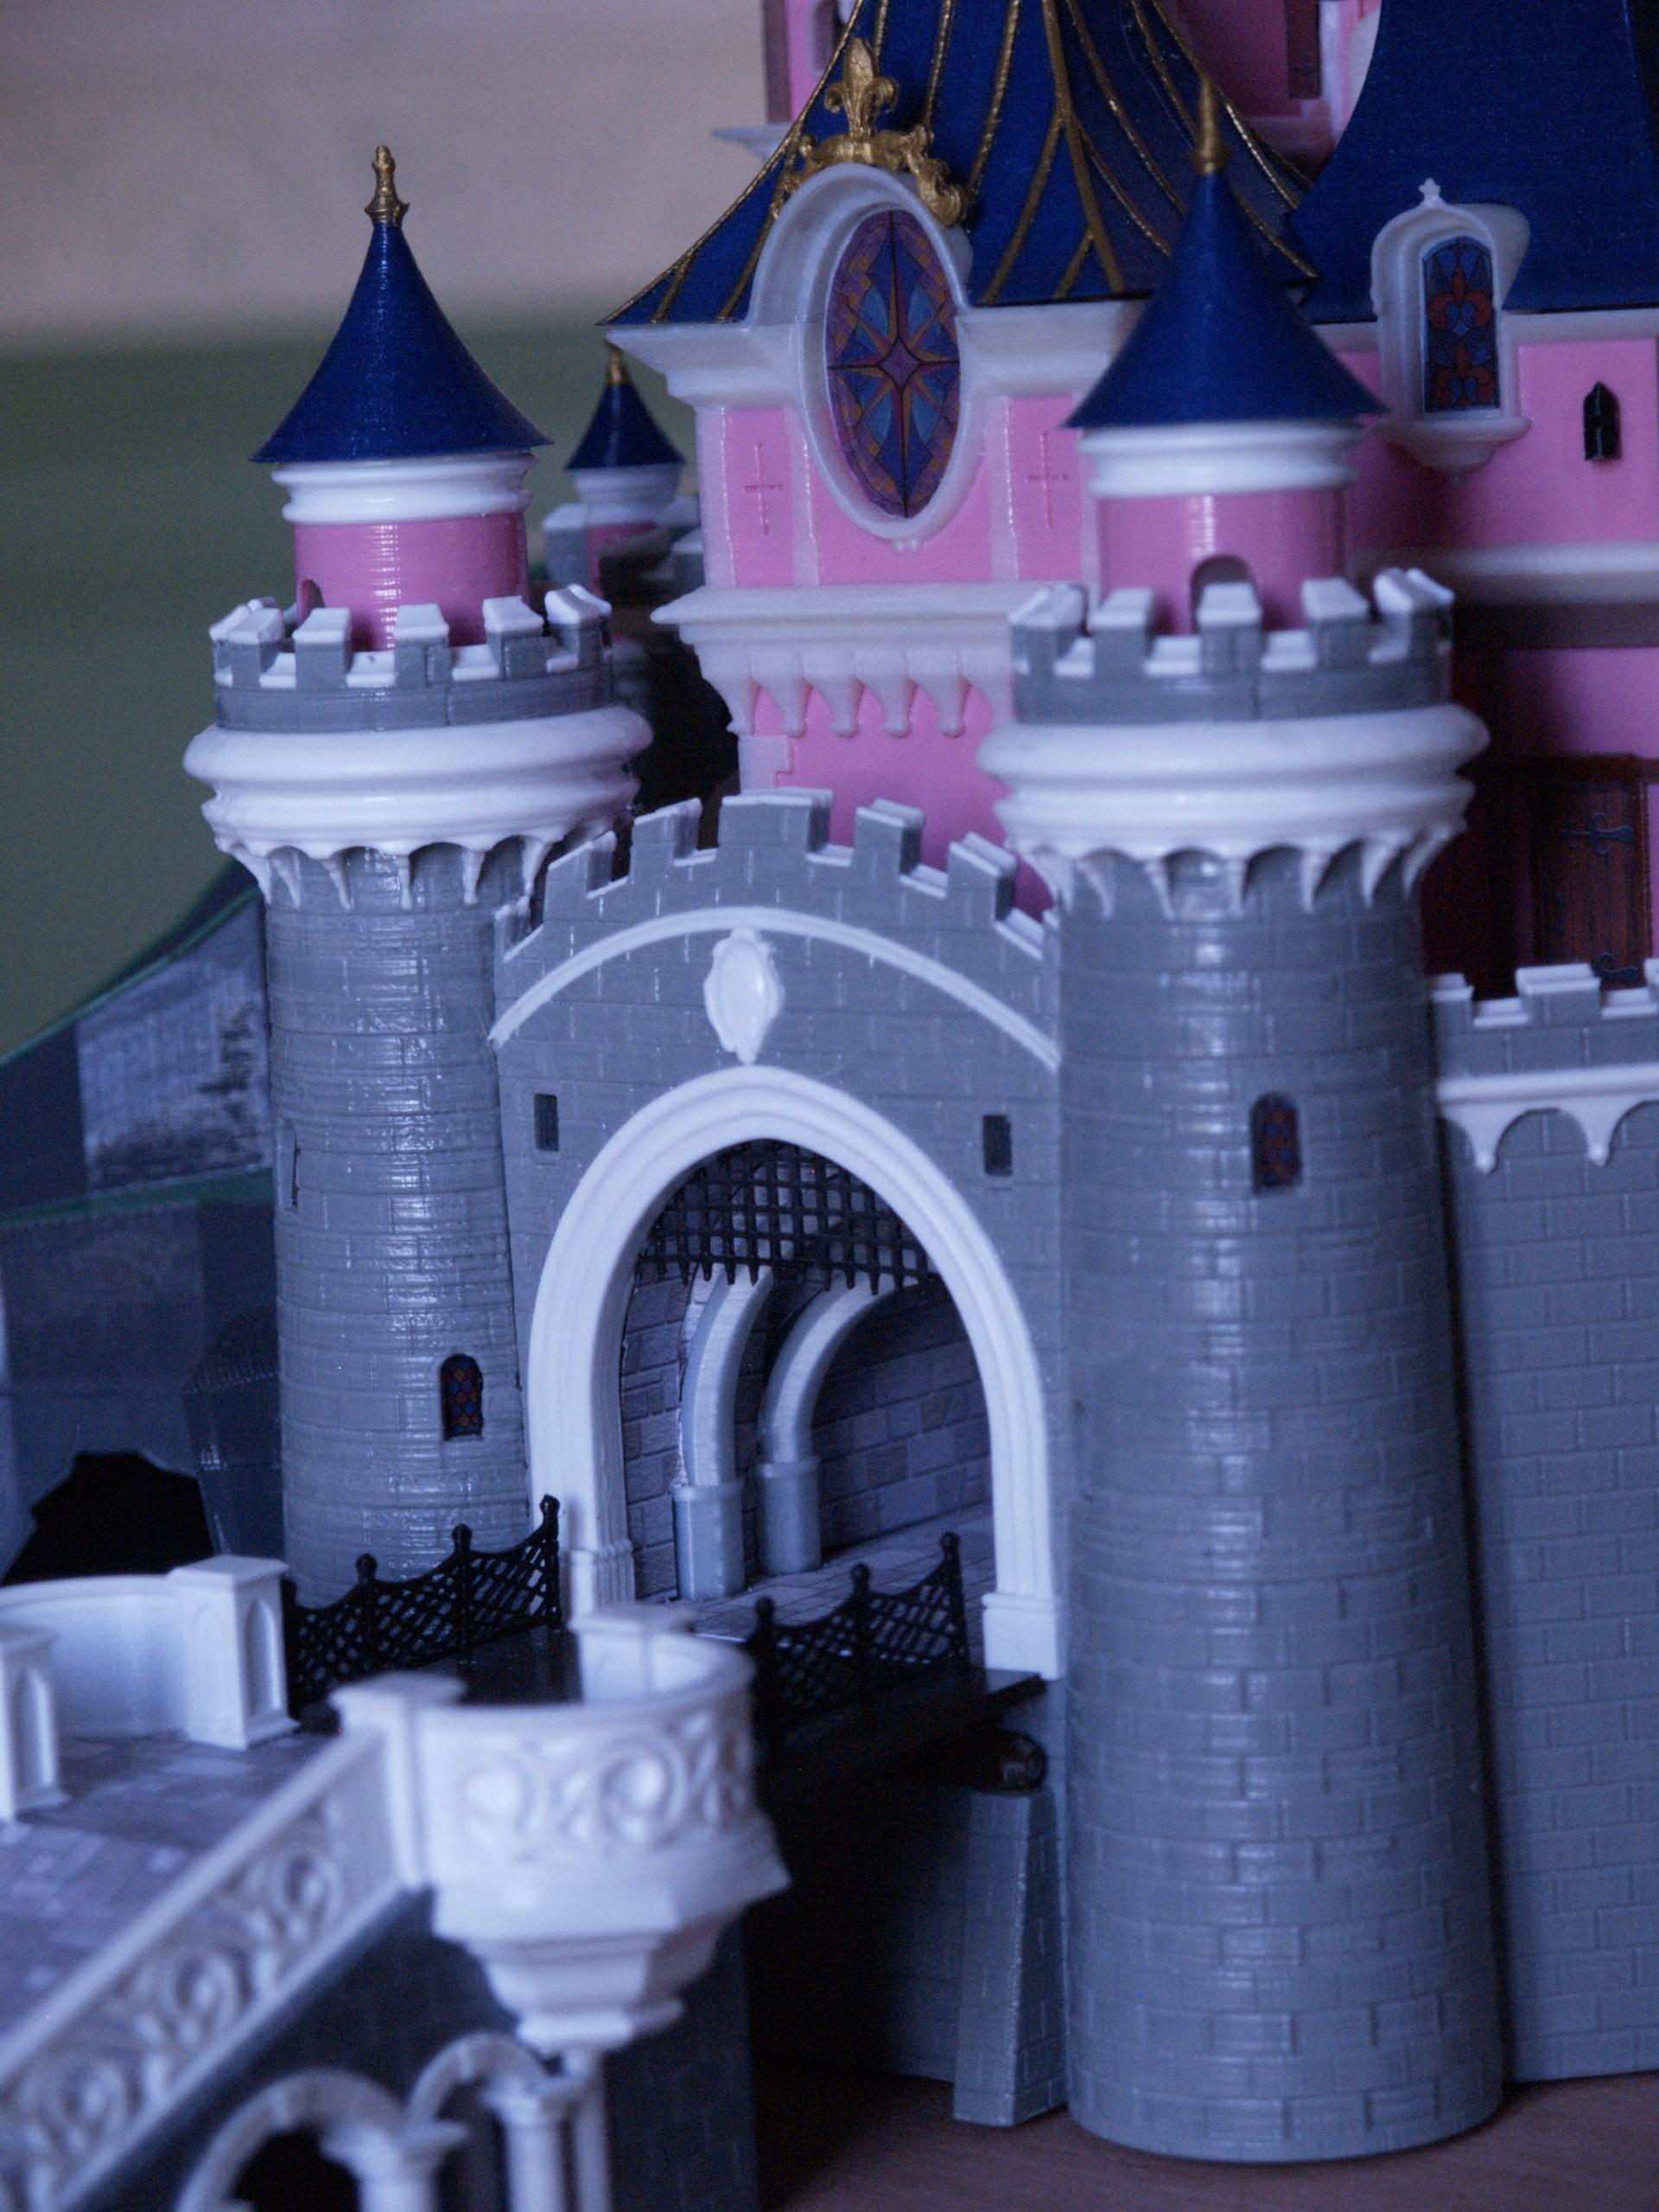 _3058320.JPG Download free STL file Chateau Disneyland Paris with Prusa MK2S MMU (Ed2) • 3D print model, Rio31